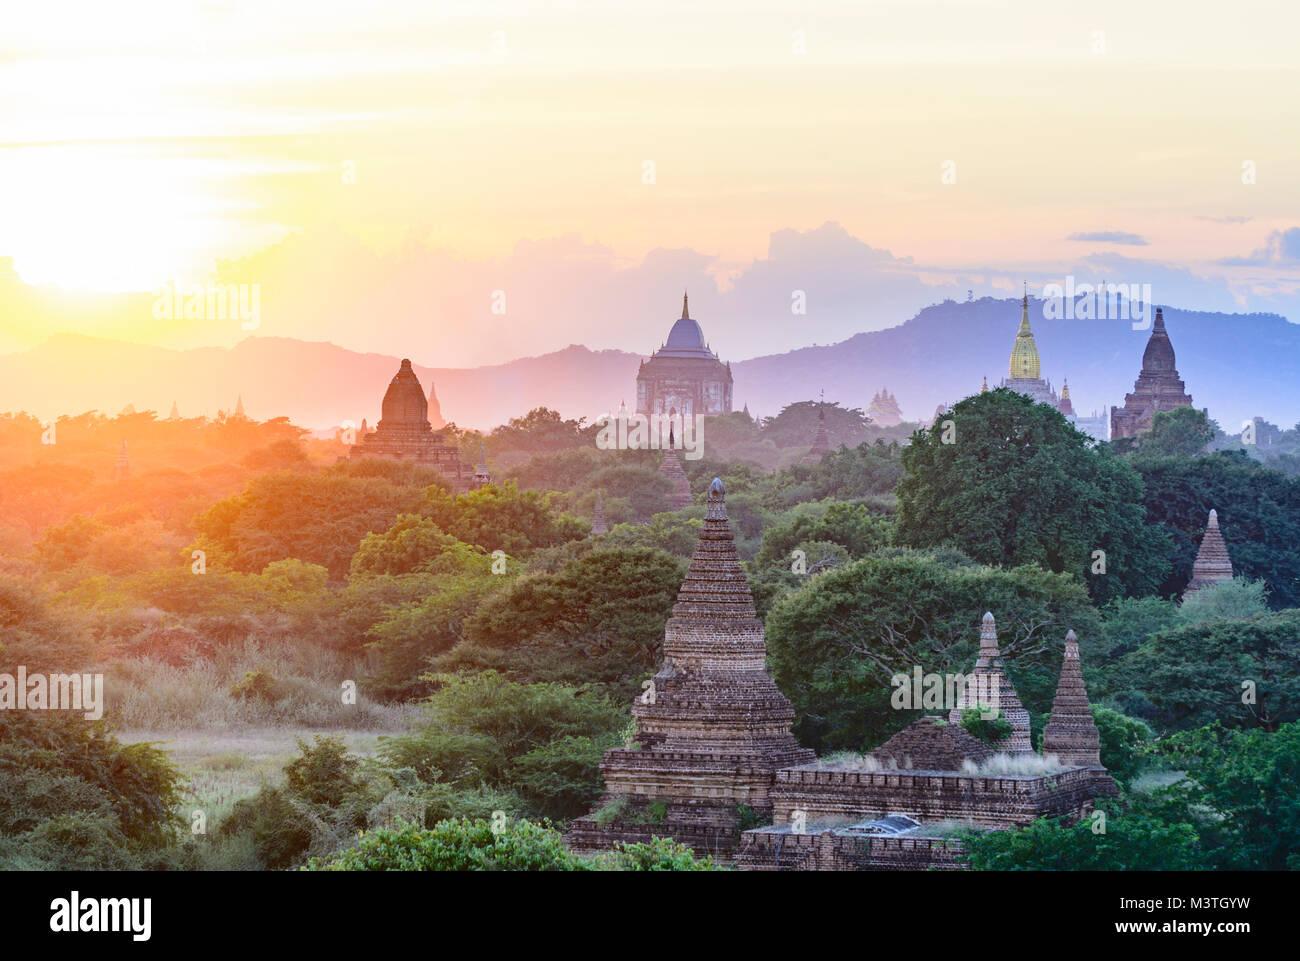 Bagan: thatbyinnyu Tempel, Ananda Tempel, Tempel in Bagan, stupa Tan Kyi Paya auf Berg, Region, Mandalay, Myanmar Stockbild